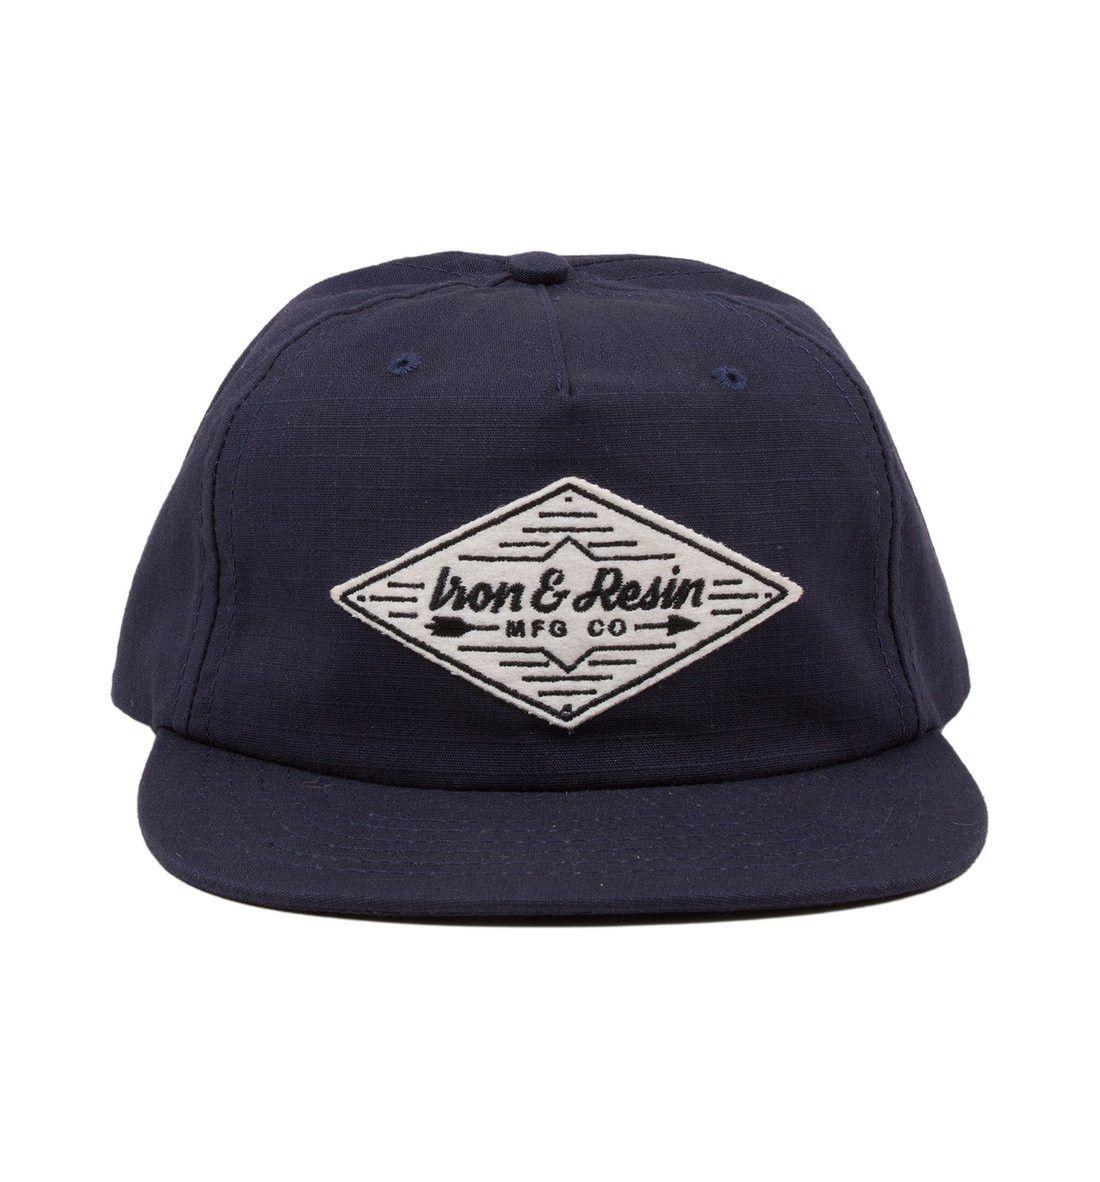 d0b0f050589 IRON   RESIN HATS